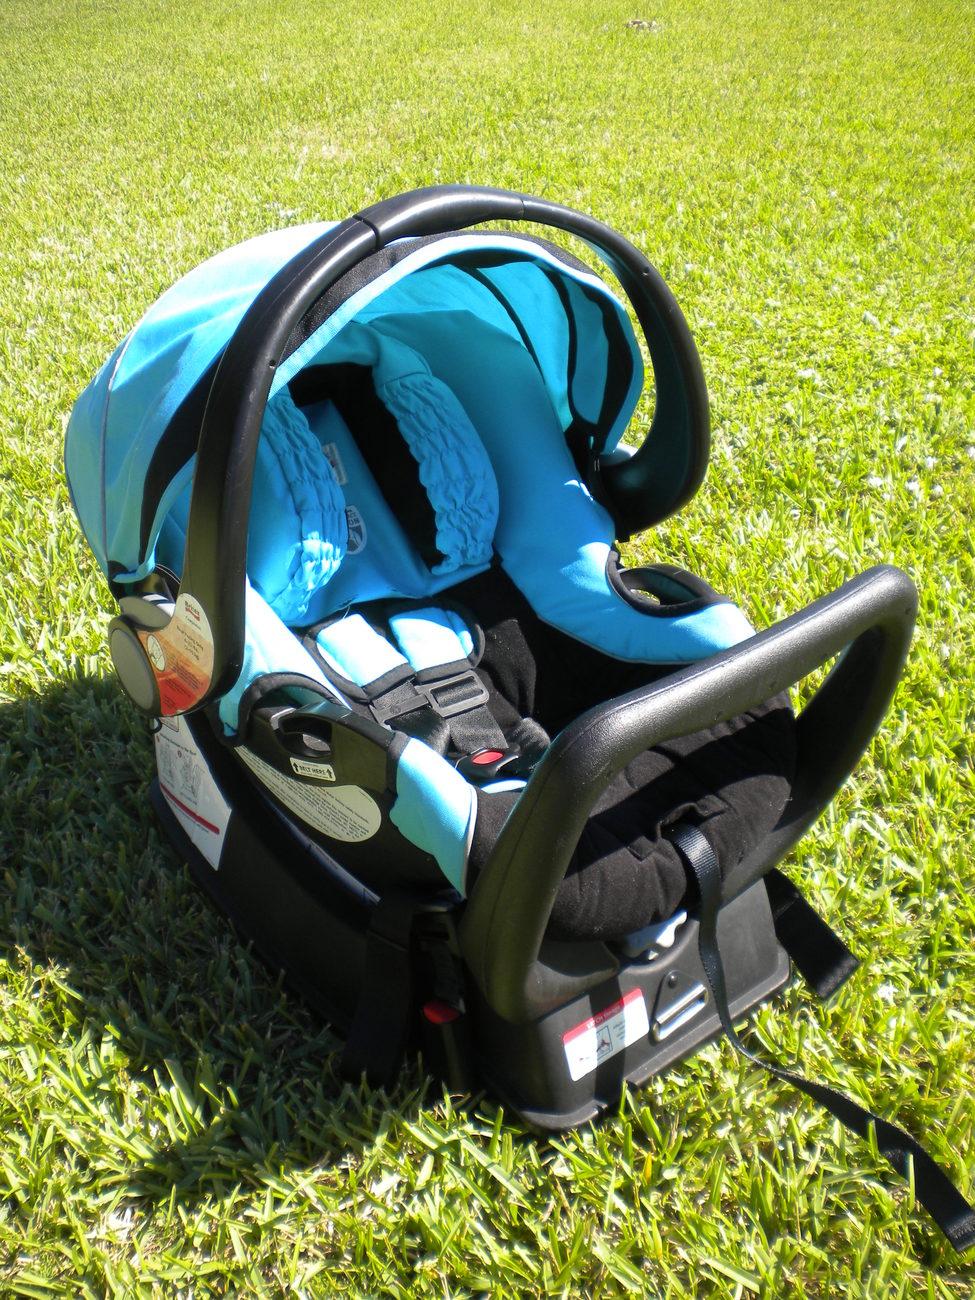 britax companion infant car seat latch base aqua black infant car seat 5 20 lbs. Black Bedroom Furniture Sets. Home Design Ideas